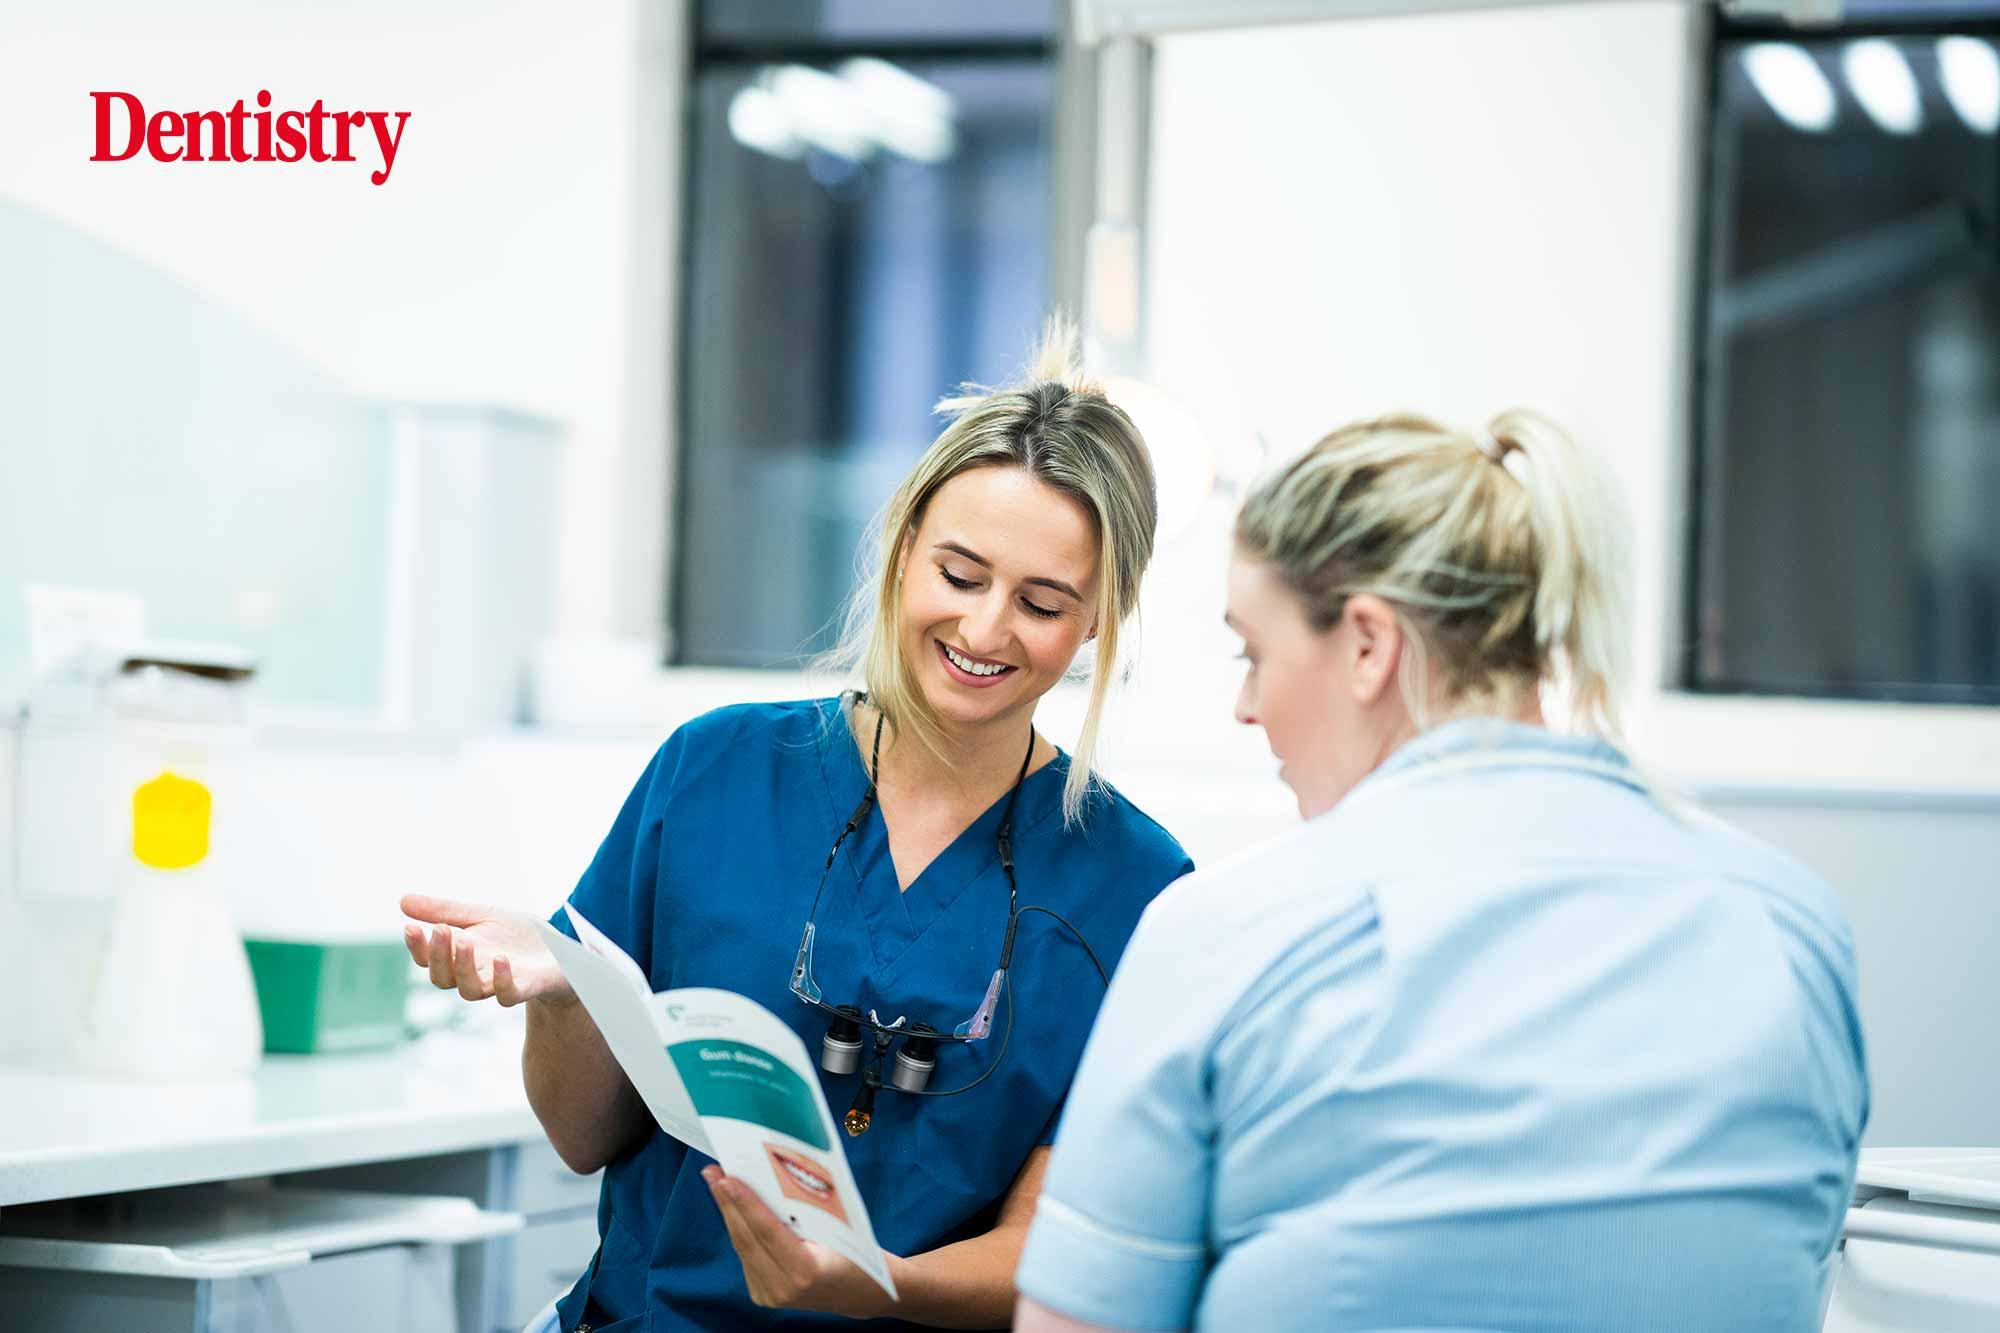 Bethany Rushworth patient communication